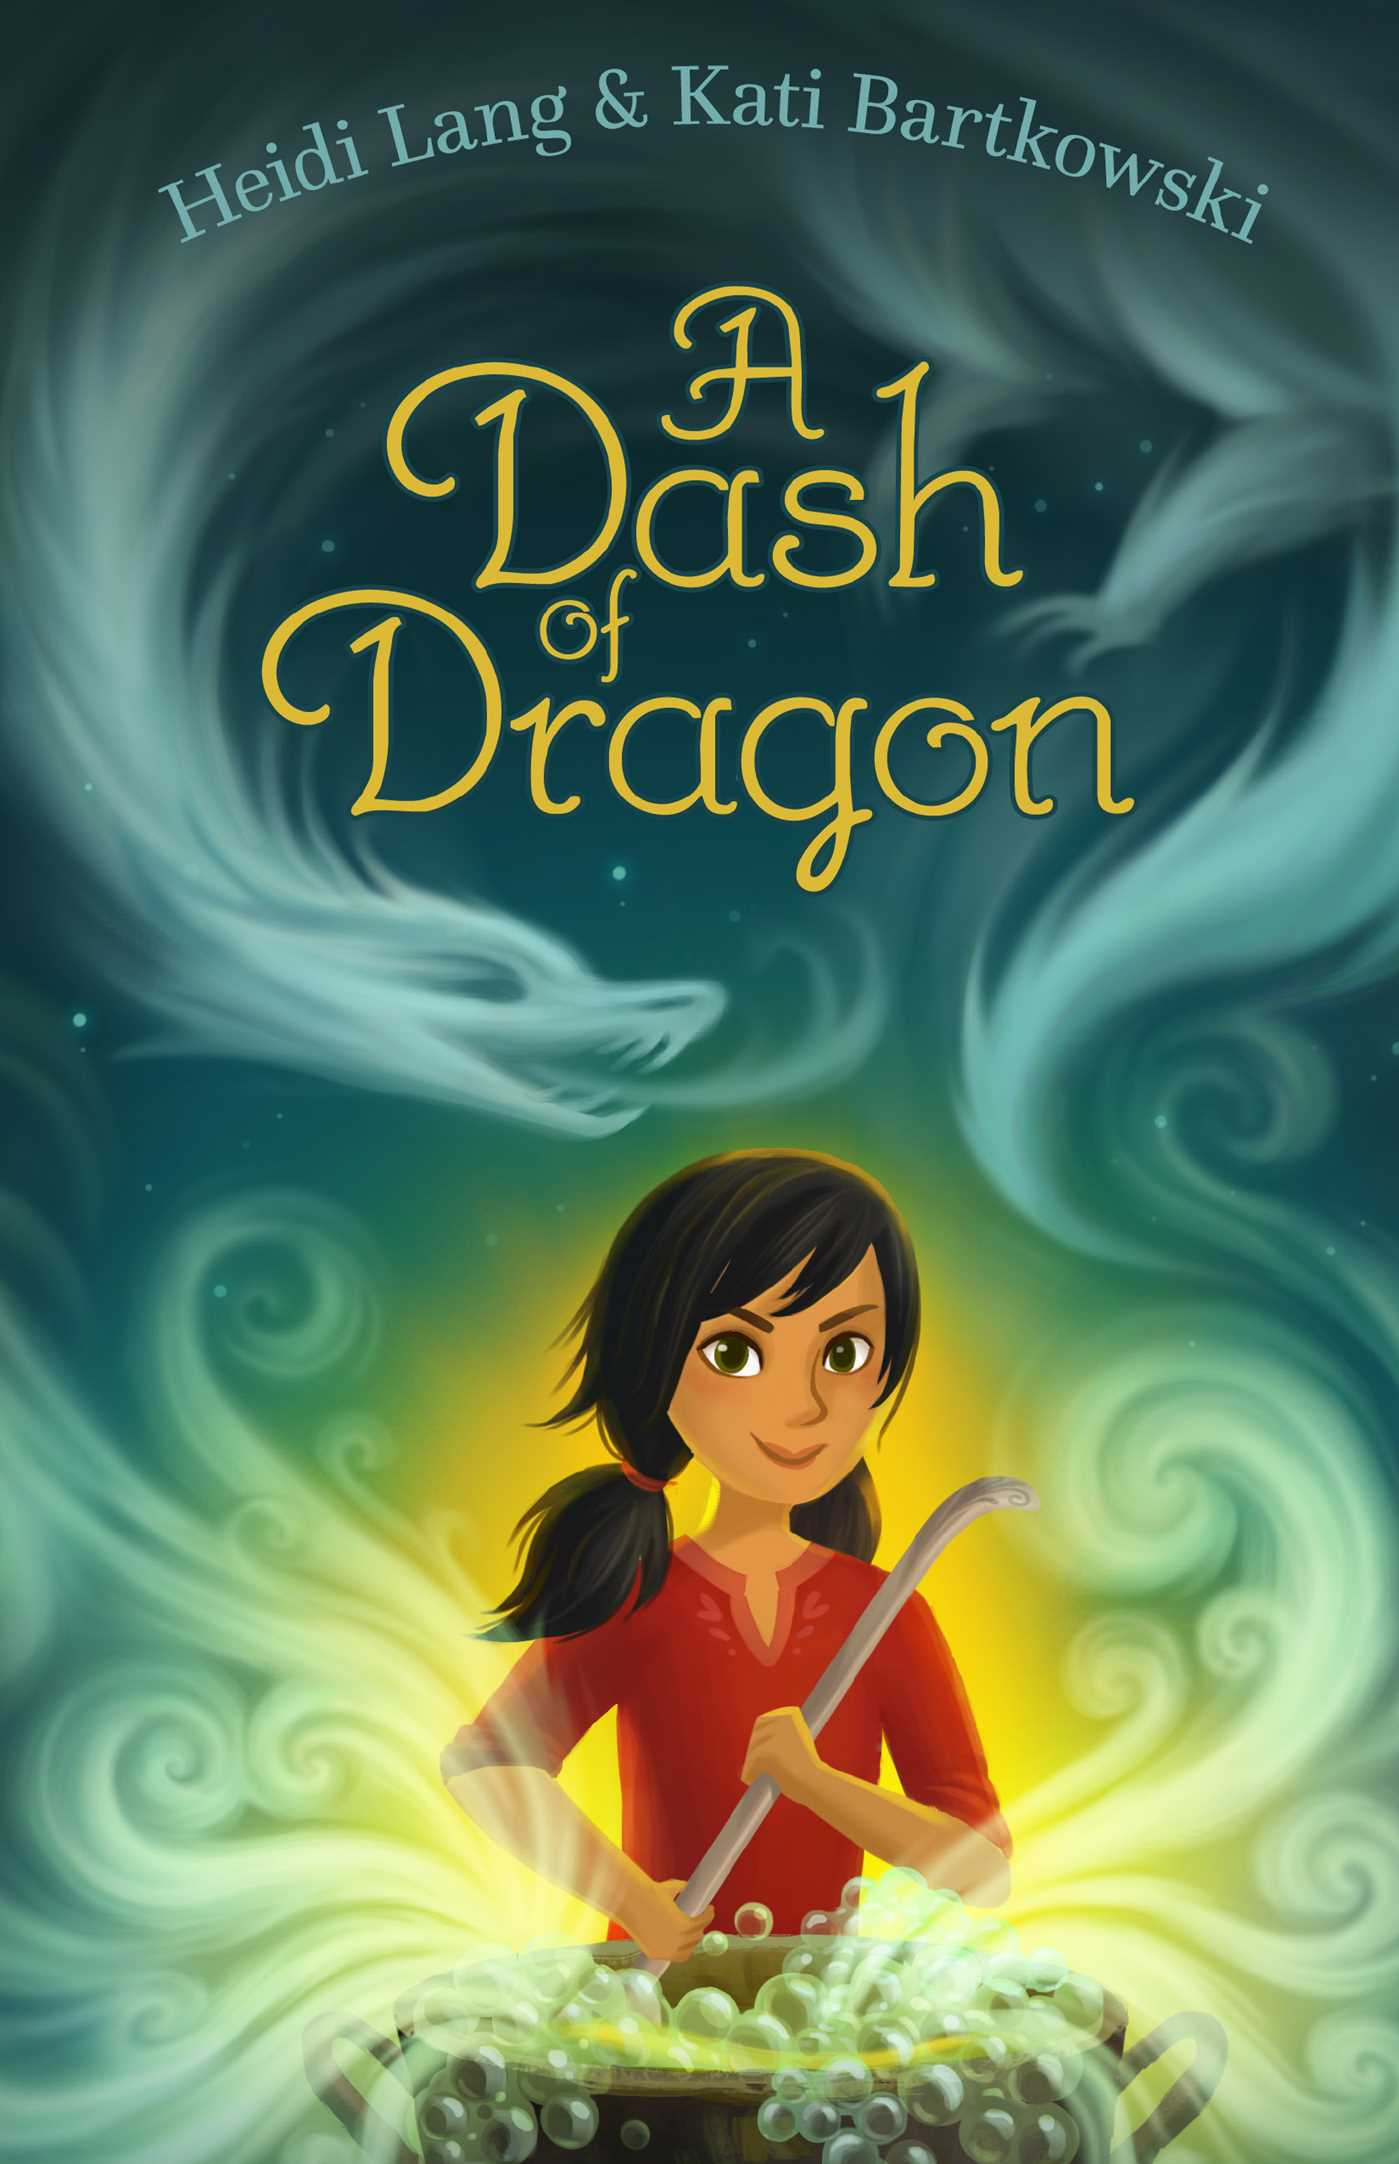 A dash of dragon 9781481477932 hr